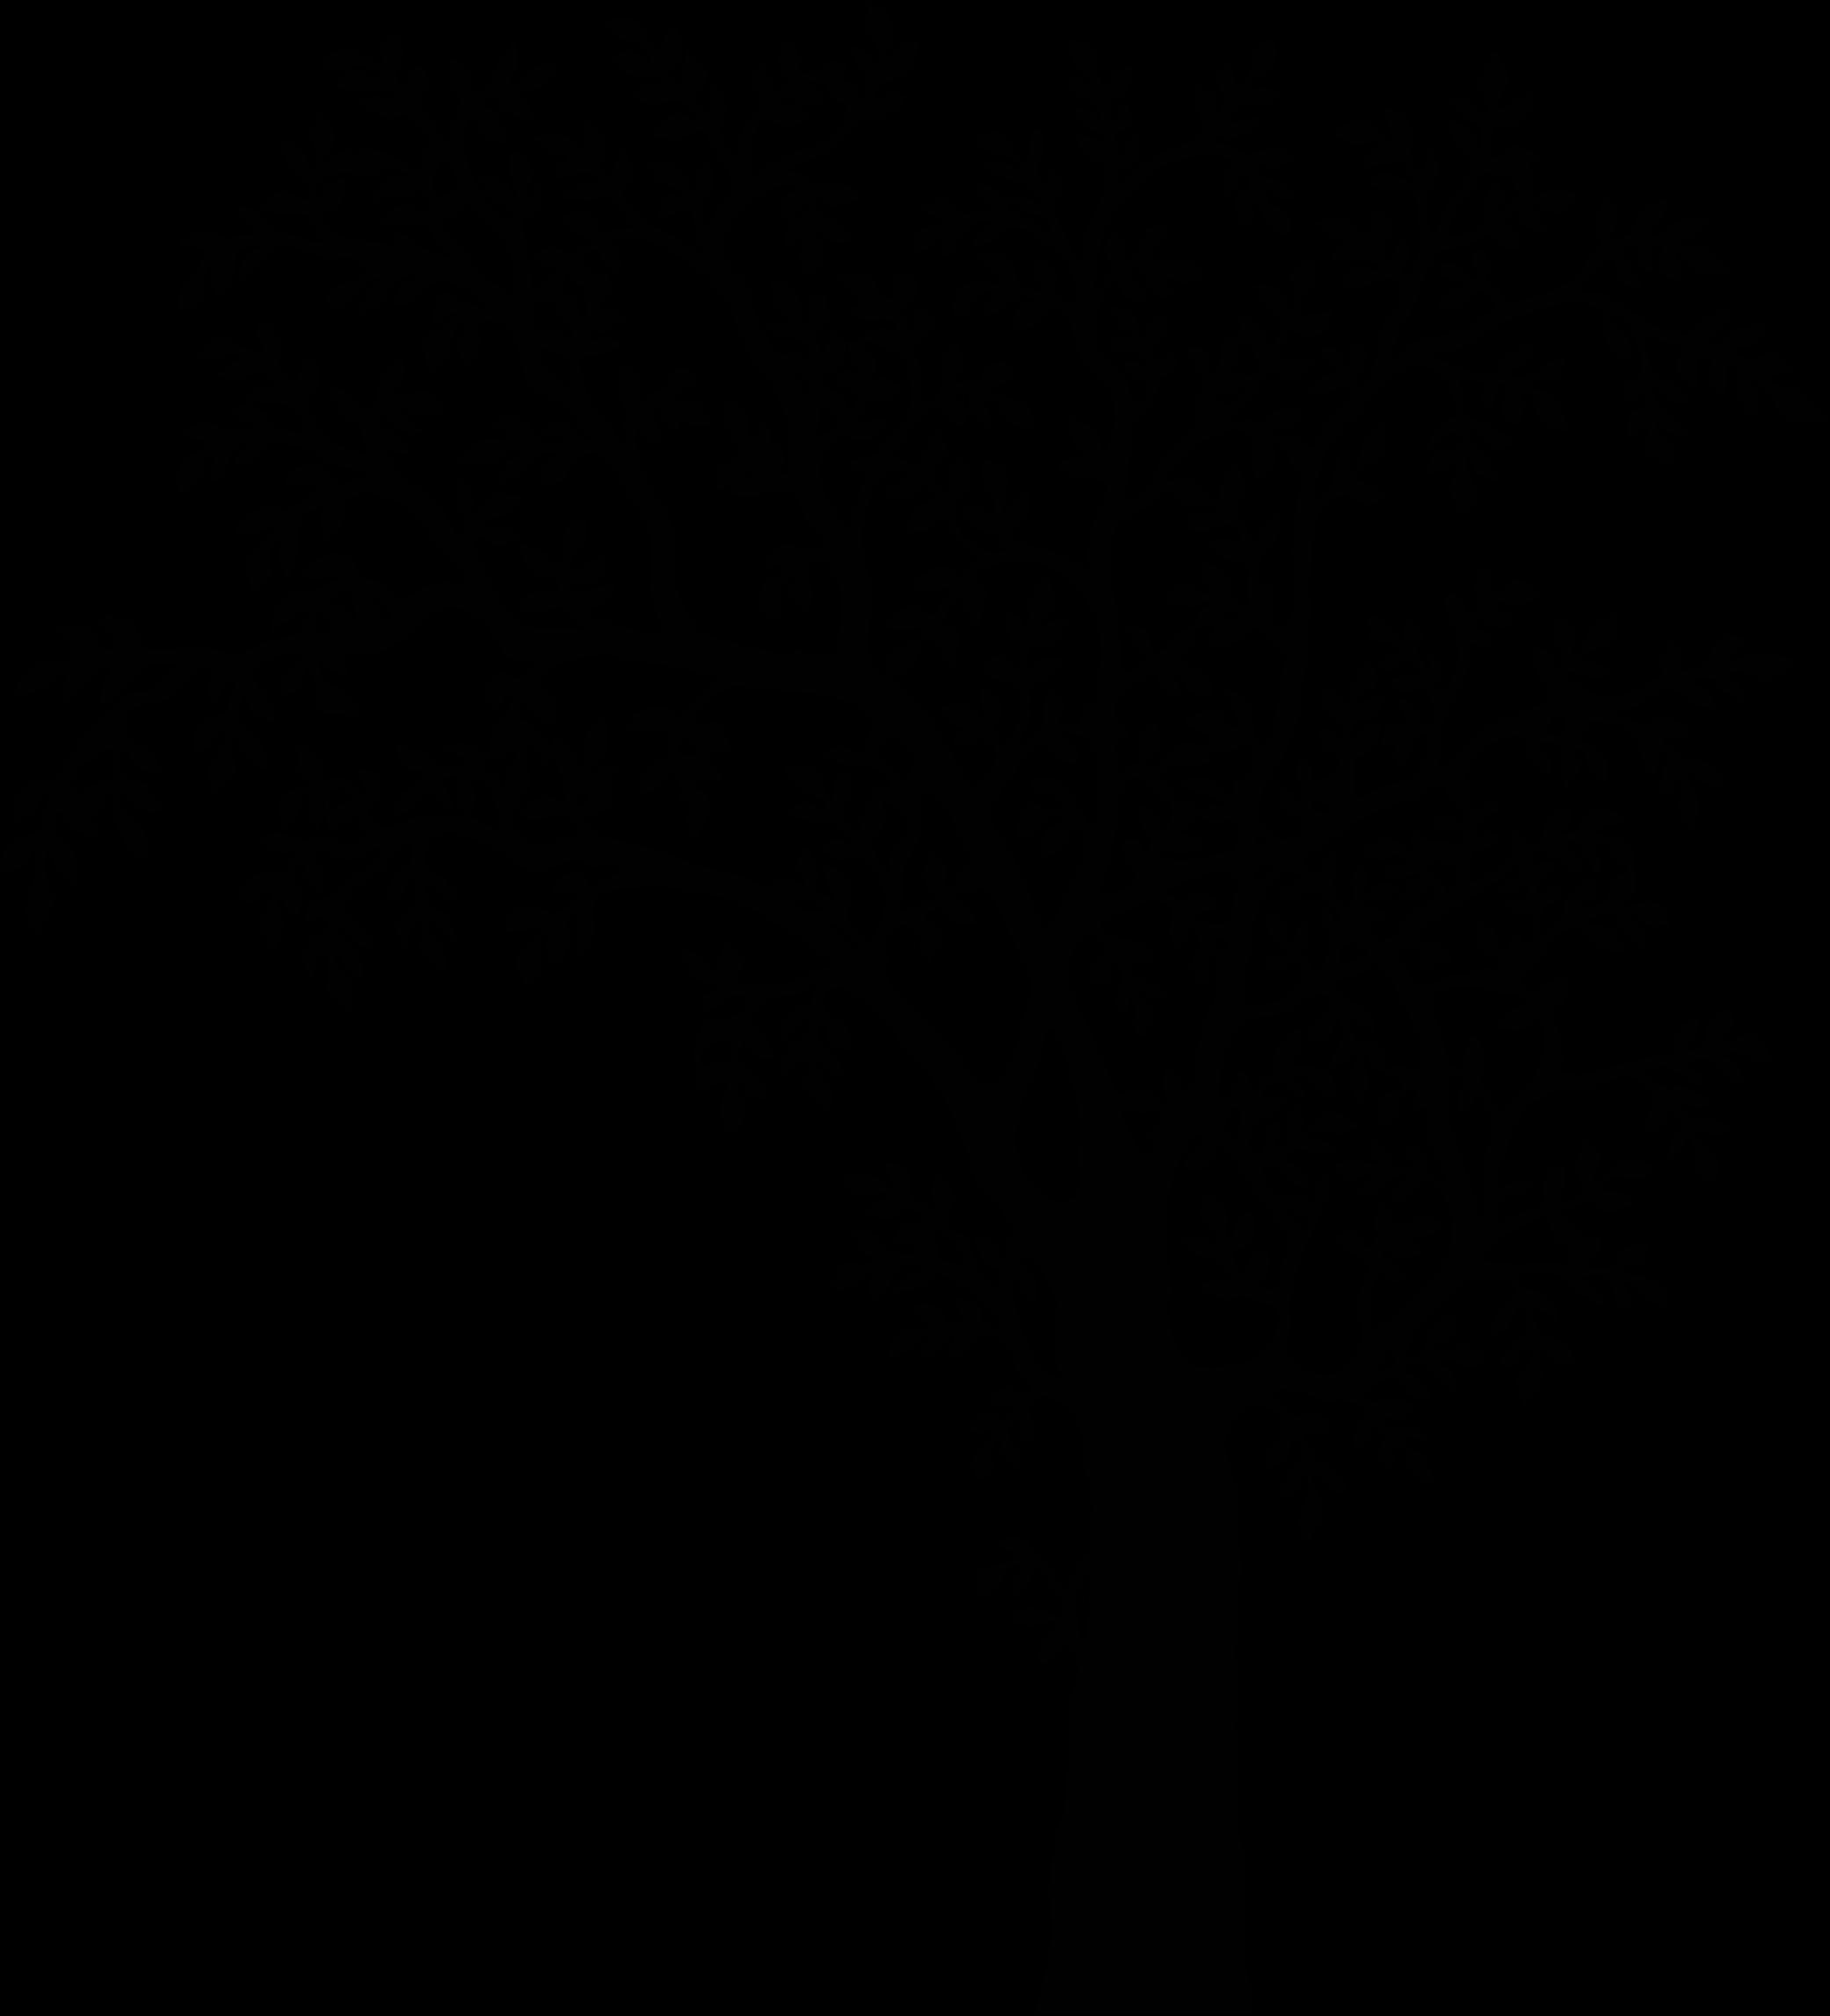 Ground clipart black and white, Ground black and white.